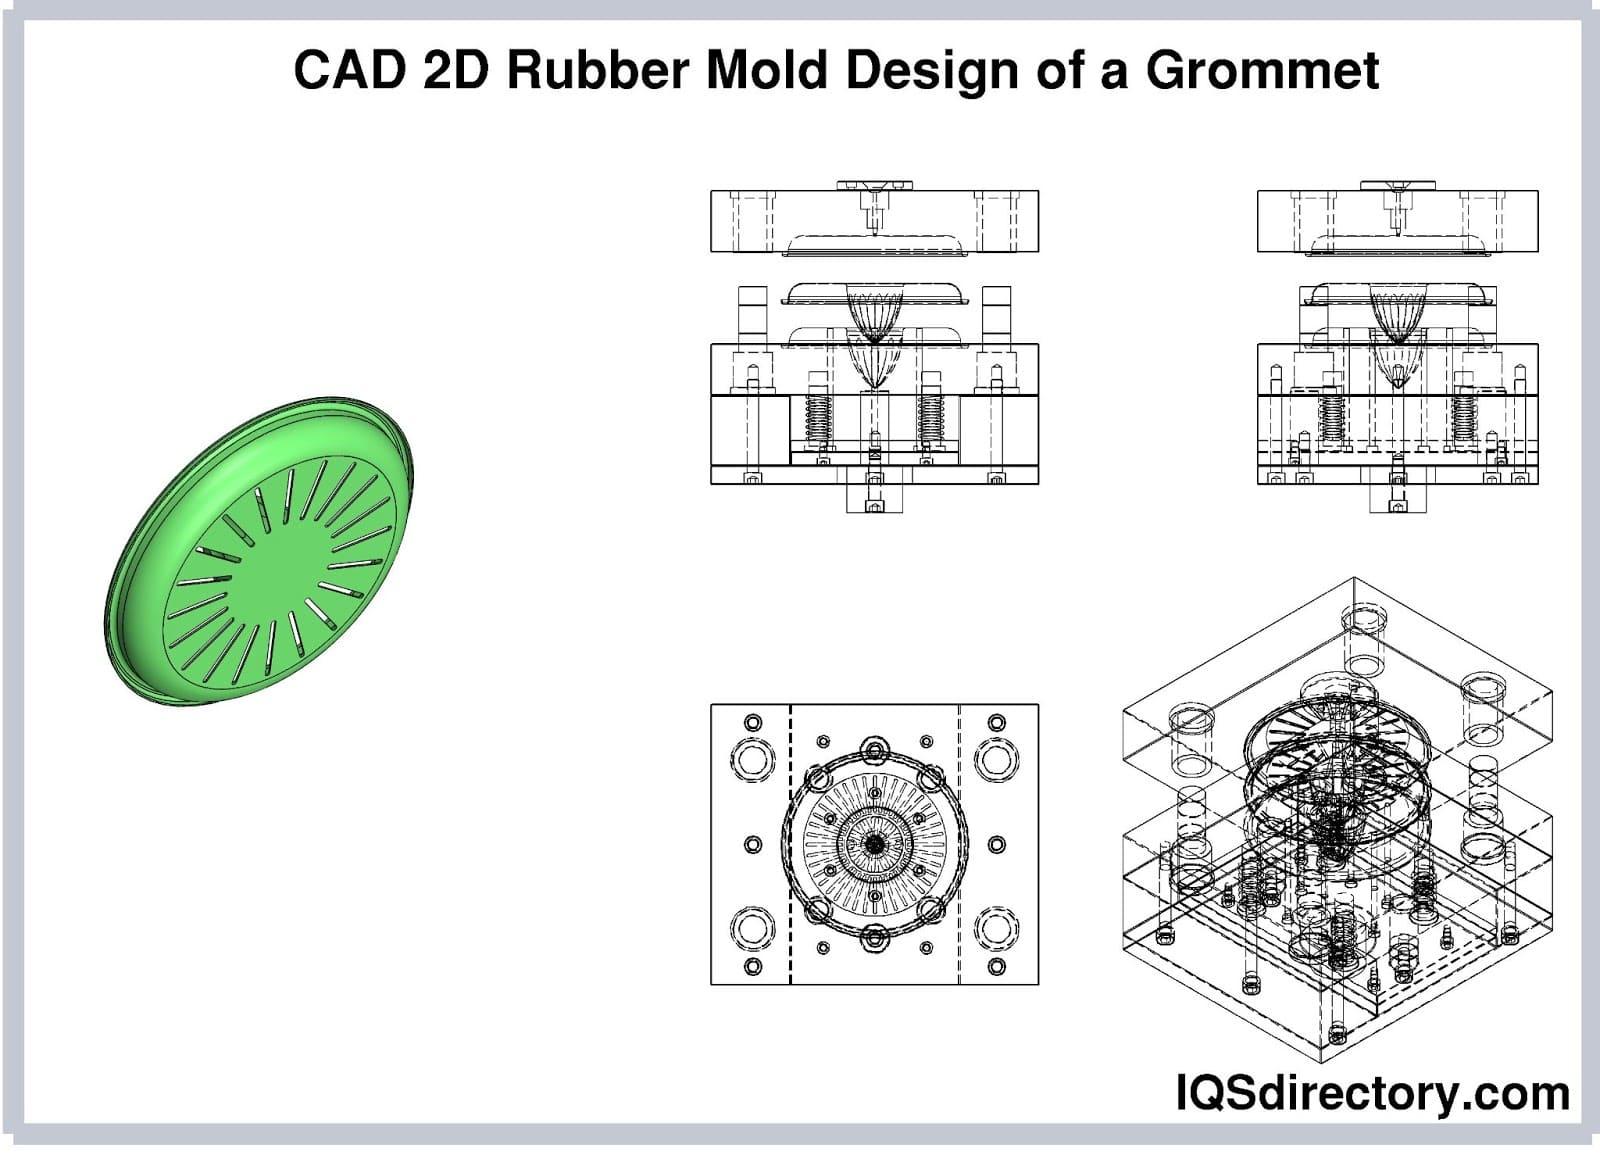 CAD 2D Rubber Mold Design of a Grommet